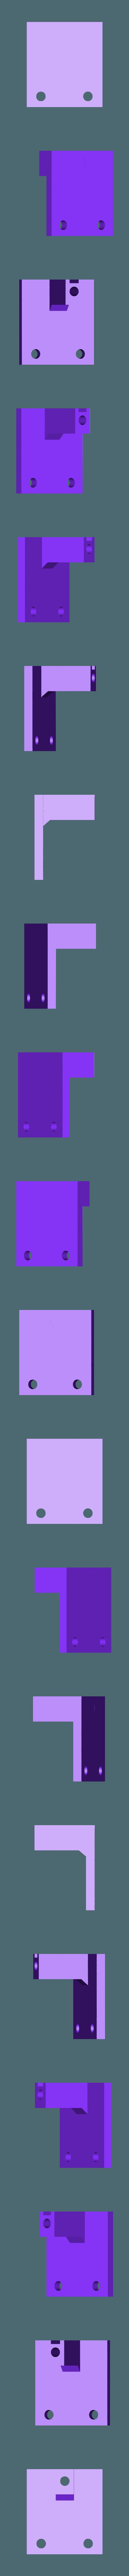 tensor para apoyar con polea aluminio plano 2.stl Download free STL file Tensioner with GT2 pulley • 3D printable model, marceloeserafino